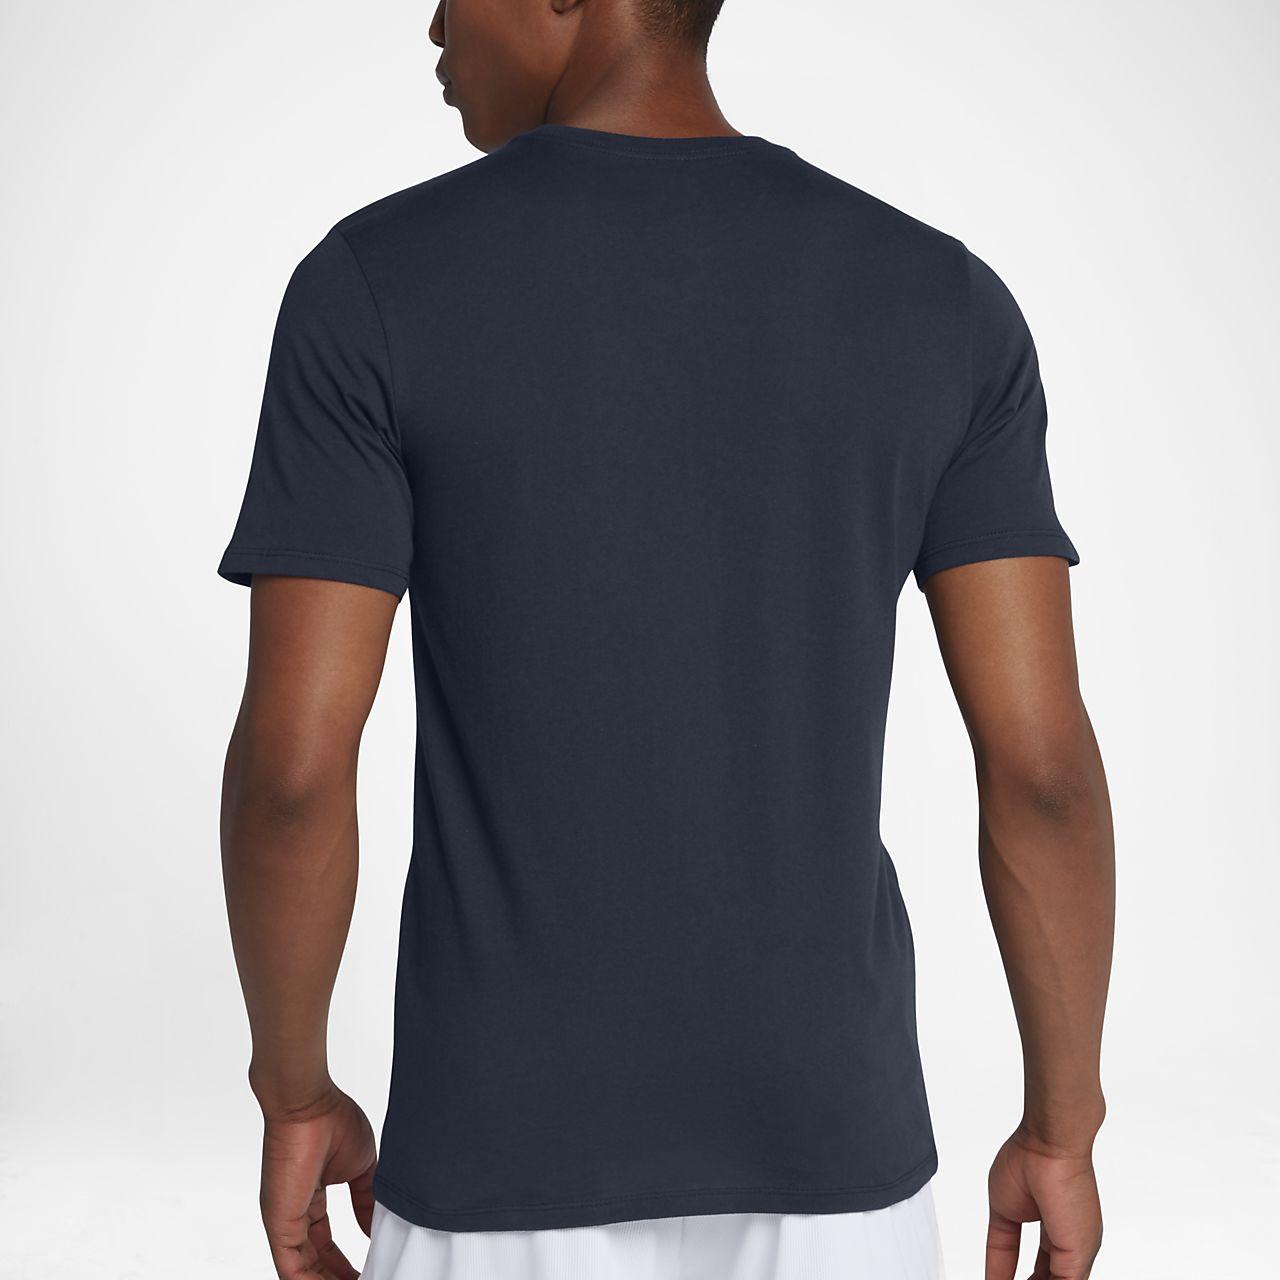 ... NikeCourt Heritage Pocket Men's Tennis T-Shirt